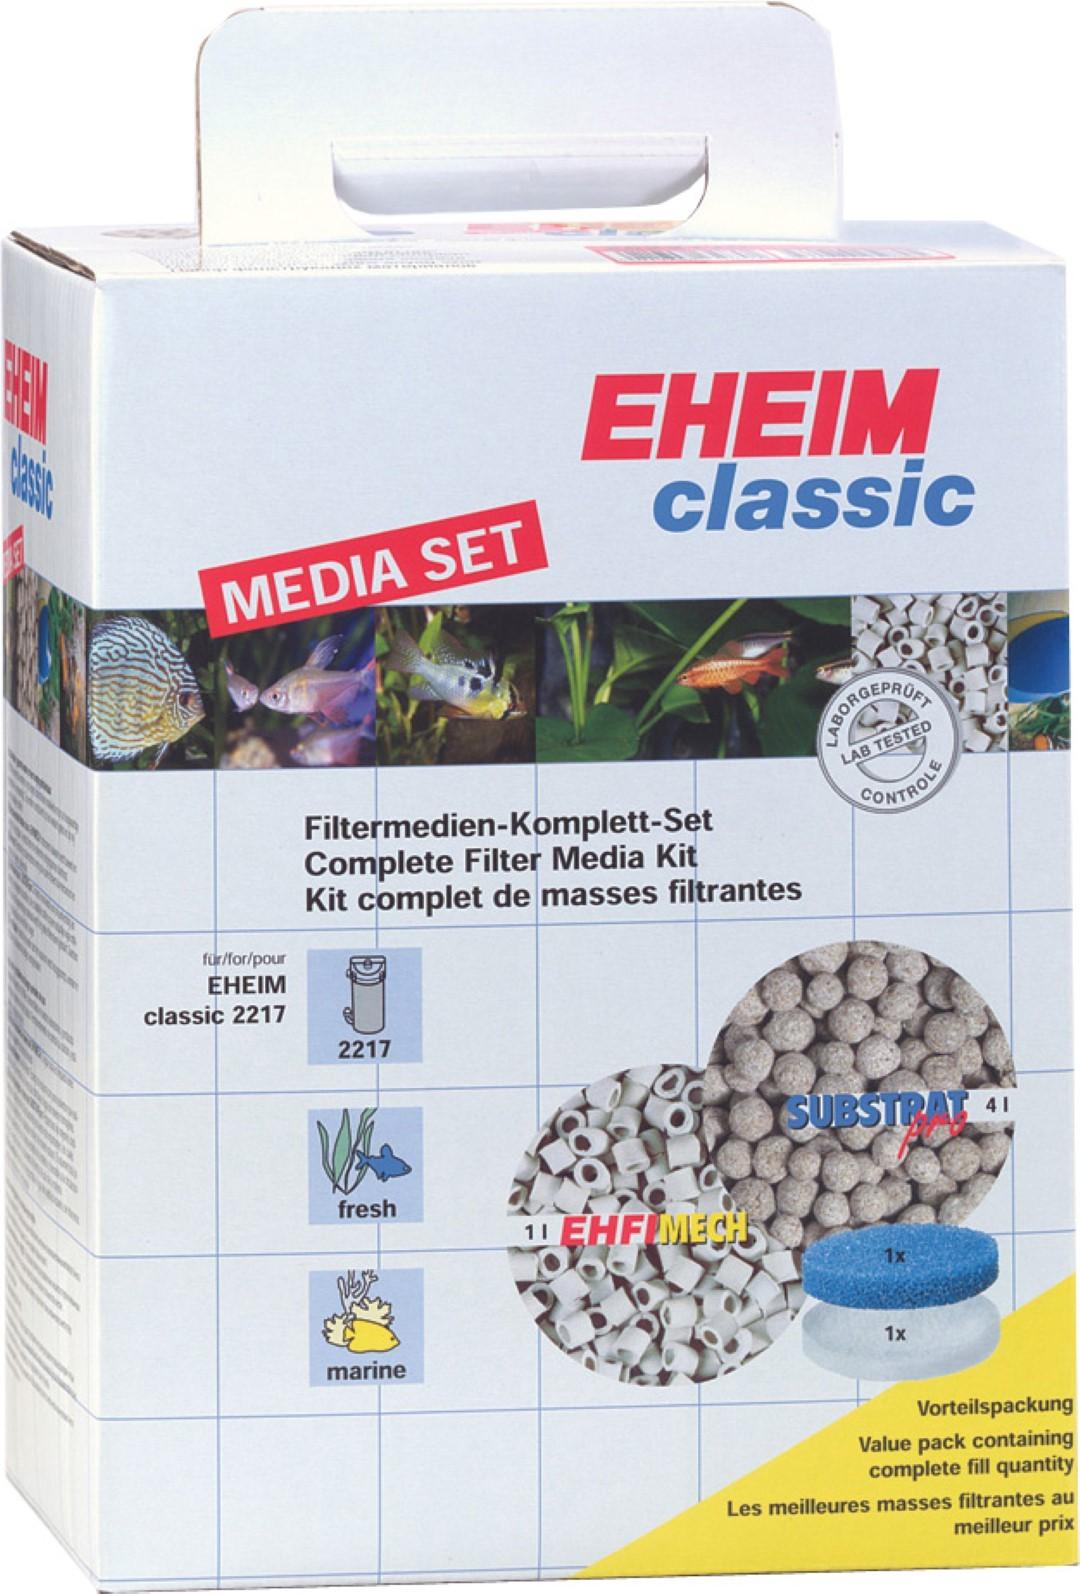 Eheim filtermedia set 2522170 voor pomp 2217/Classic 600